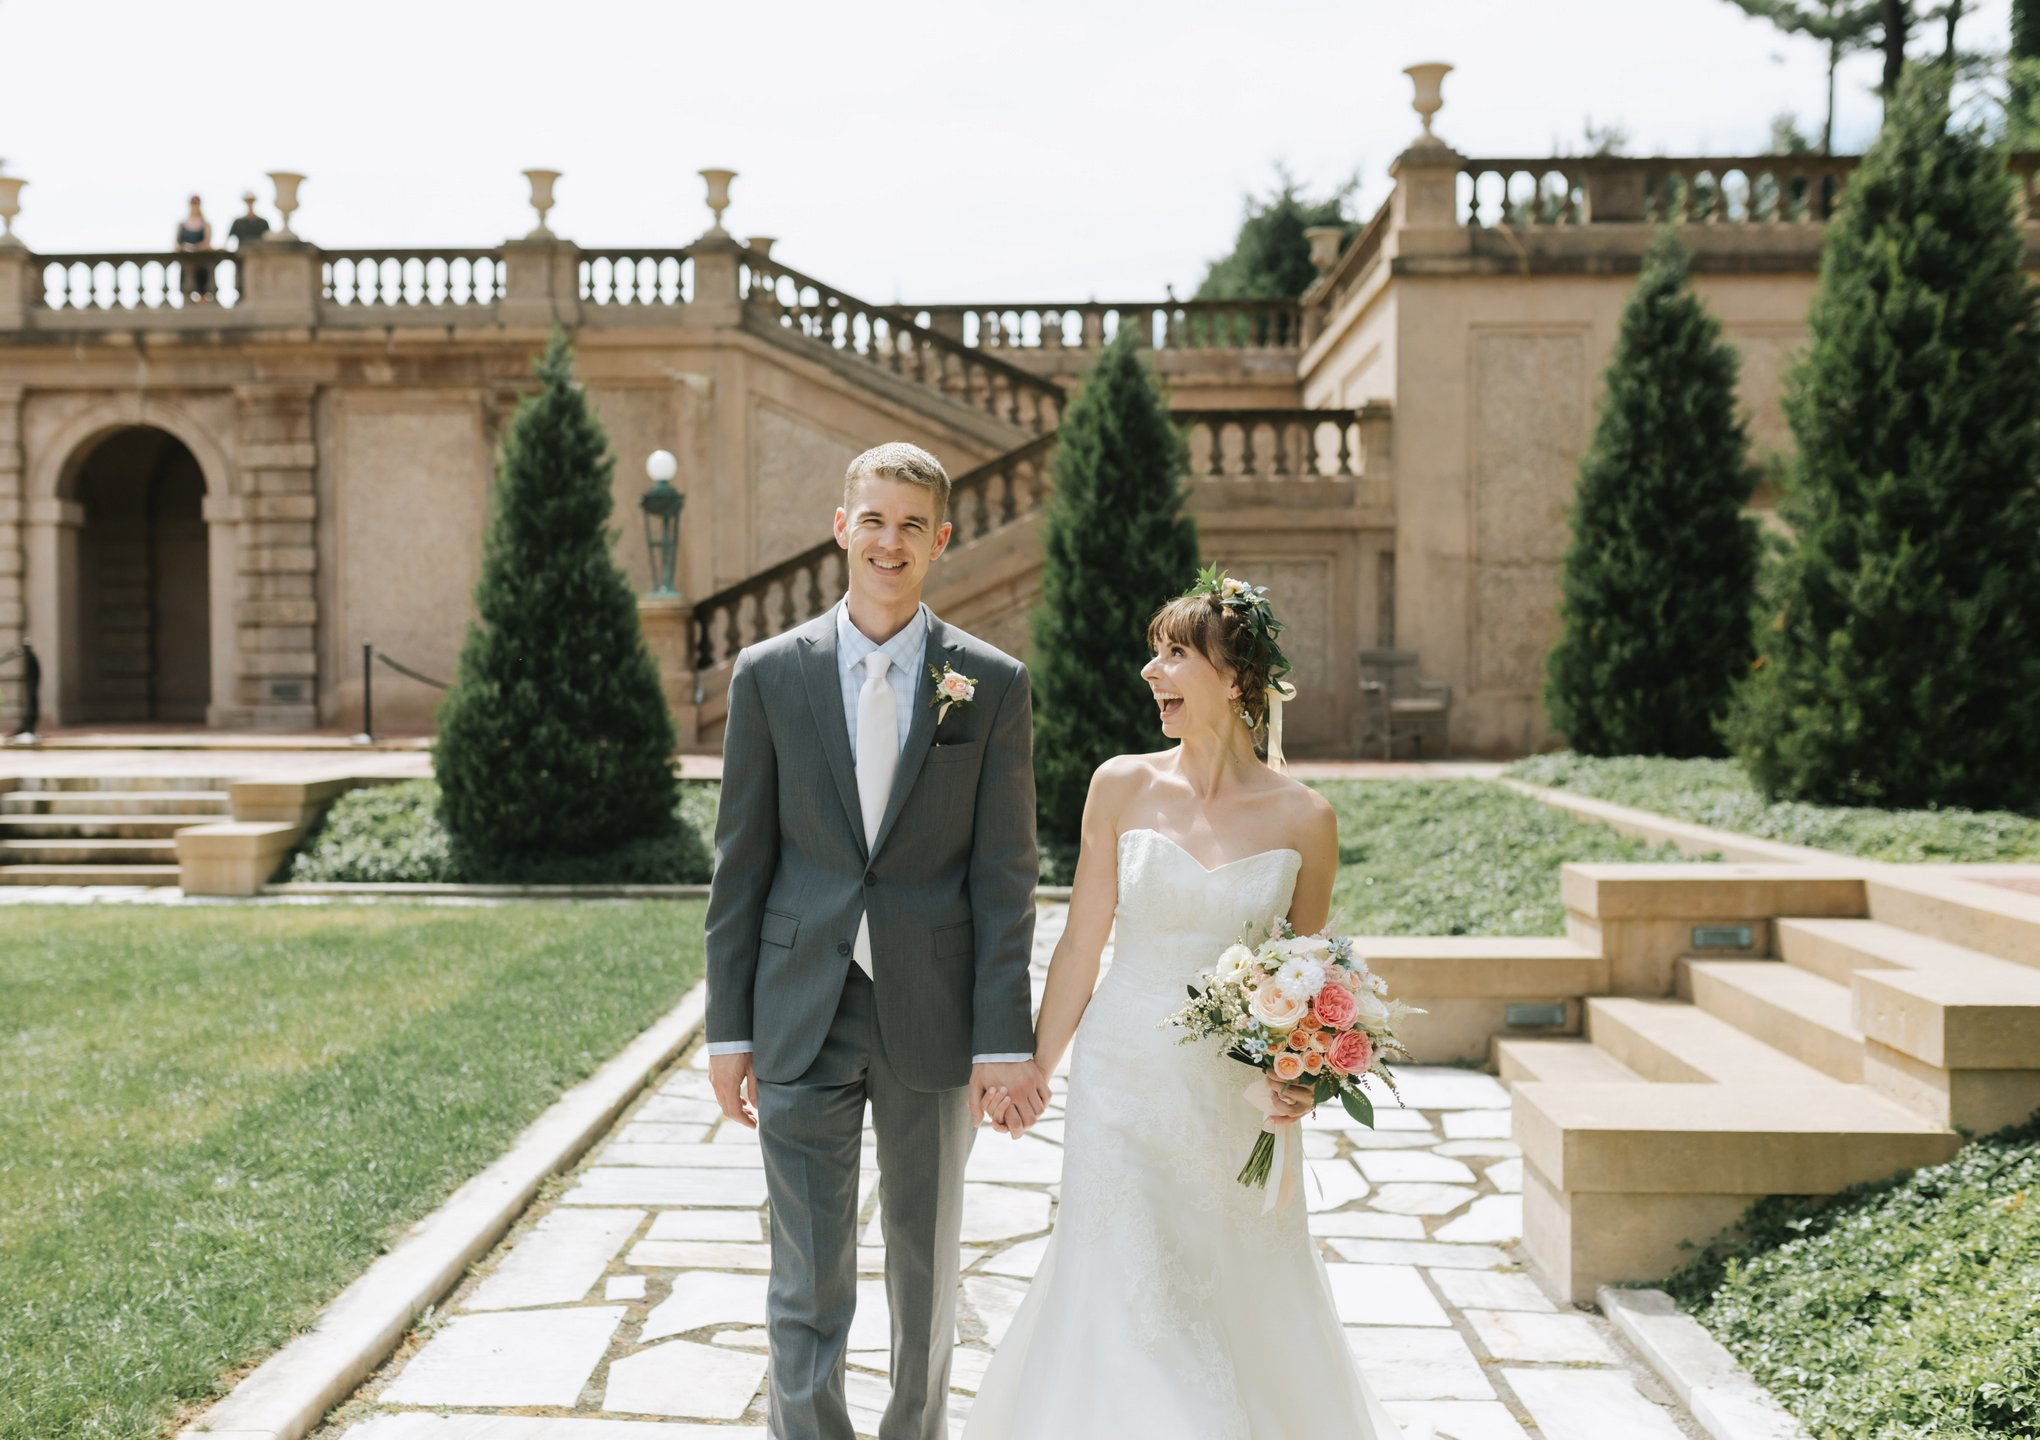 Crane-Estate-Vow-Renewal-Wedding-20.JPG